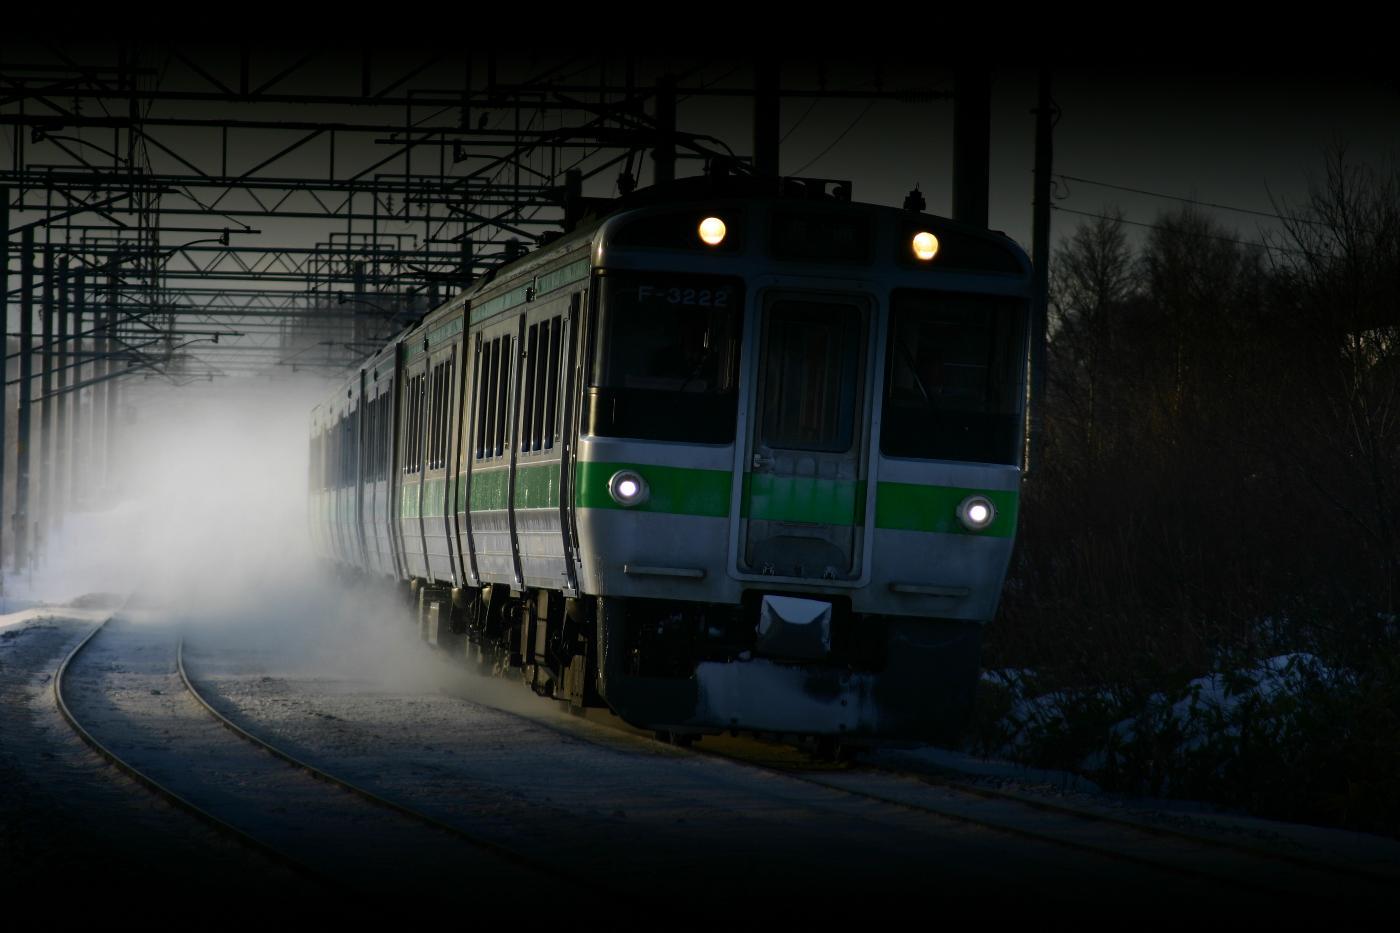 Jr111229002